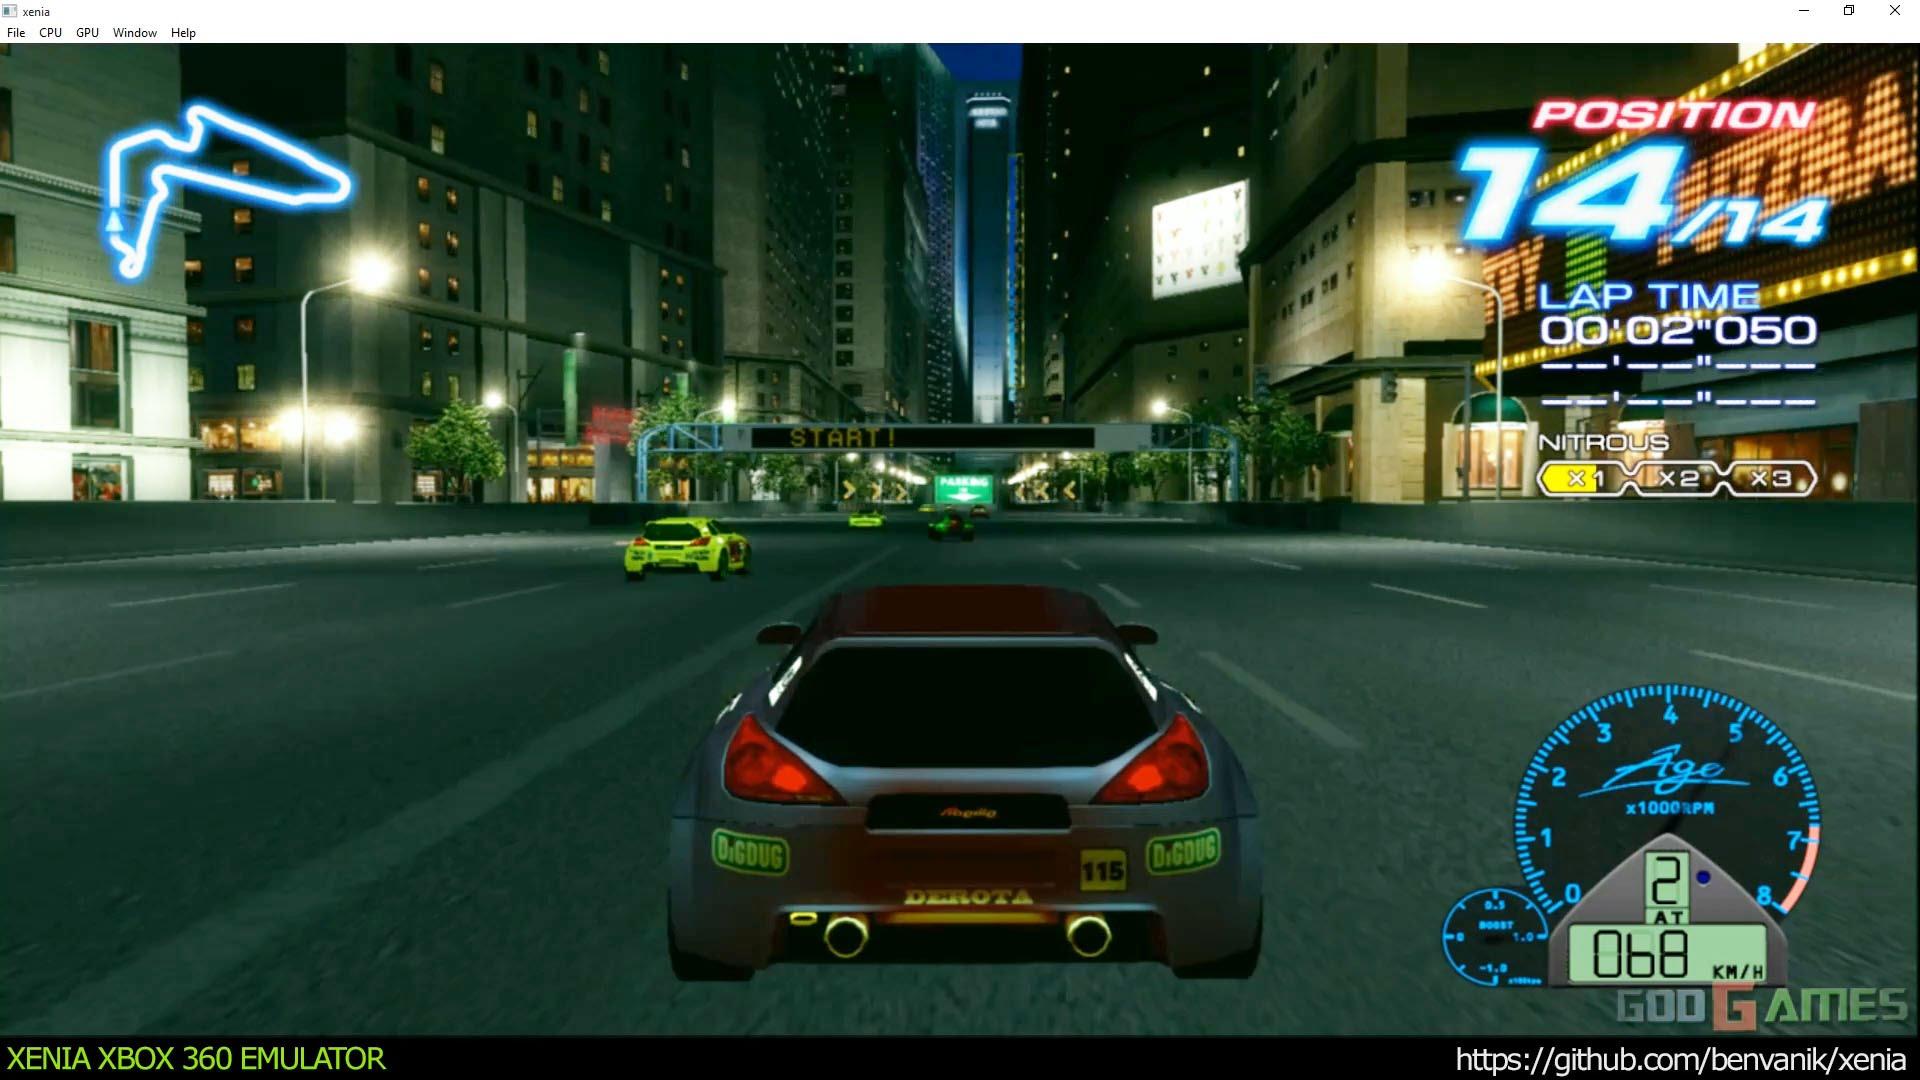 Ridge Racer 6 wallpapers, Video Game, HQ Ridge Racer 6